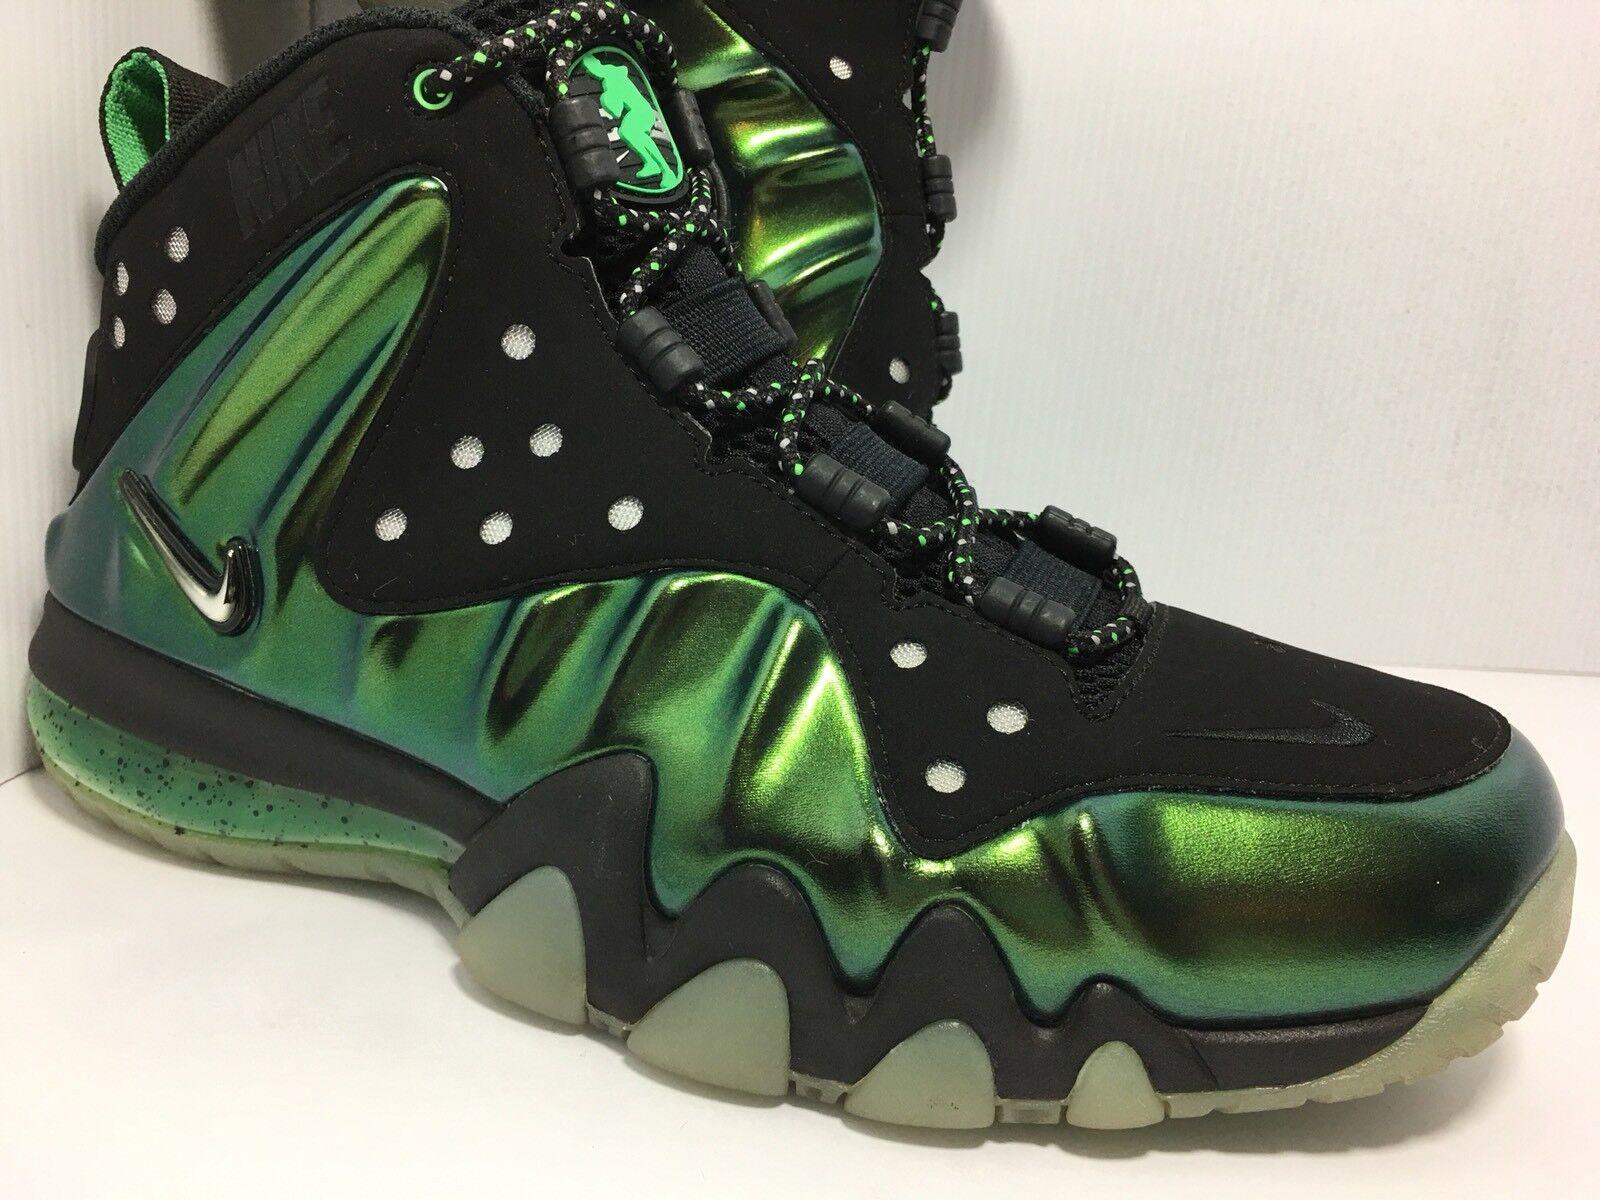 Air Nike Barkley Posite Max 'Gamma Green' Basketball Basketball Basketball shoes 555097 301 Sz 8 8fd669